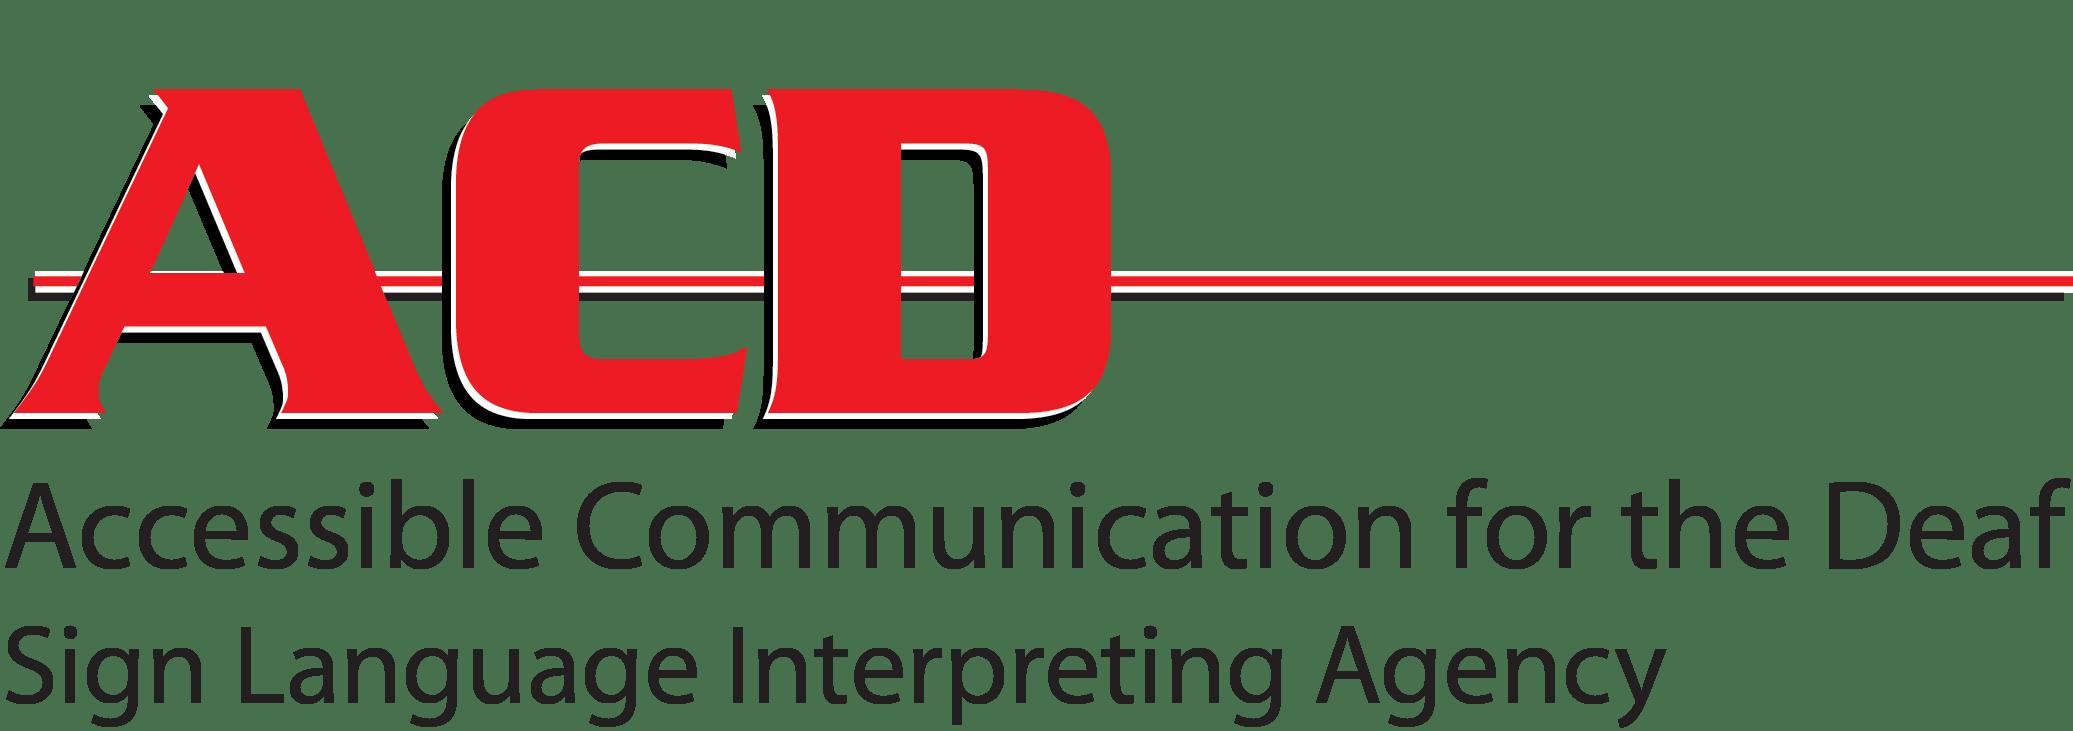 Sign Language Interpreting Agency